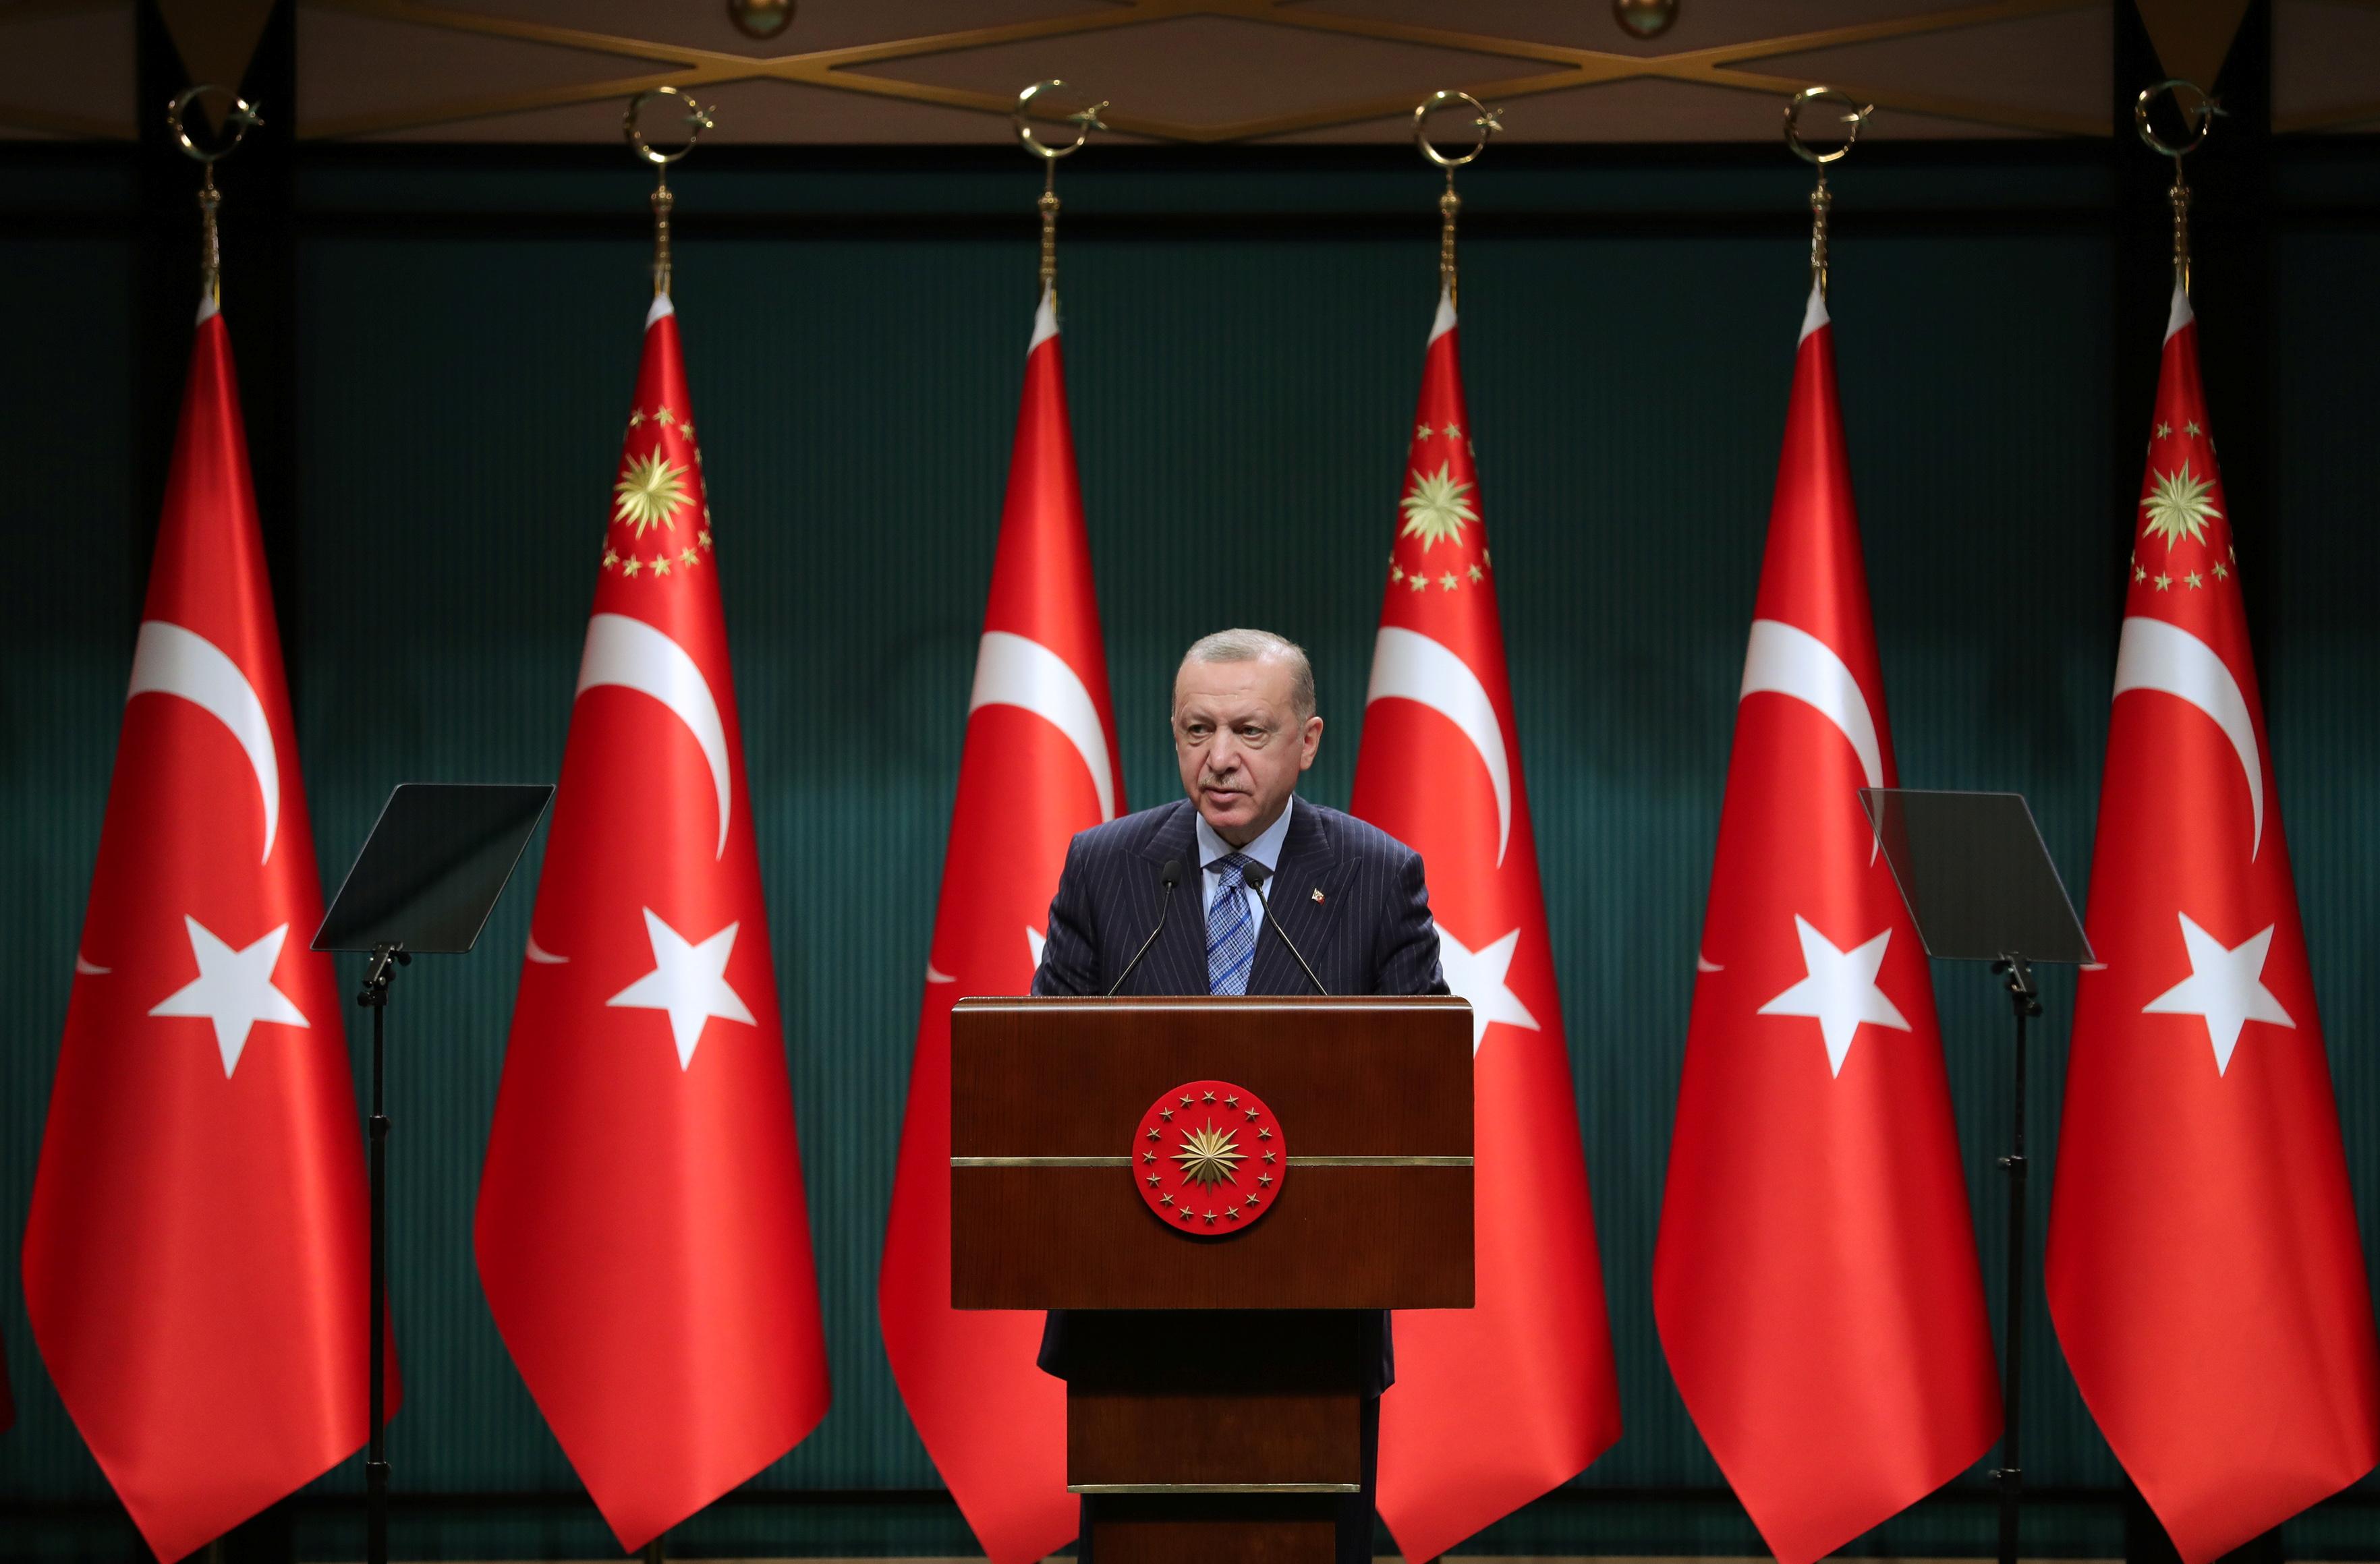 Turkish President Tayyip Erdogan gives a statement after a cabinet meeting in Ankara, Turkey, May 17, 2021. Murat Cetinmuhurdar/PPO/Handout via REUTERS